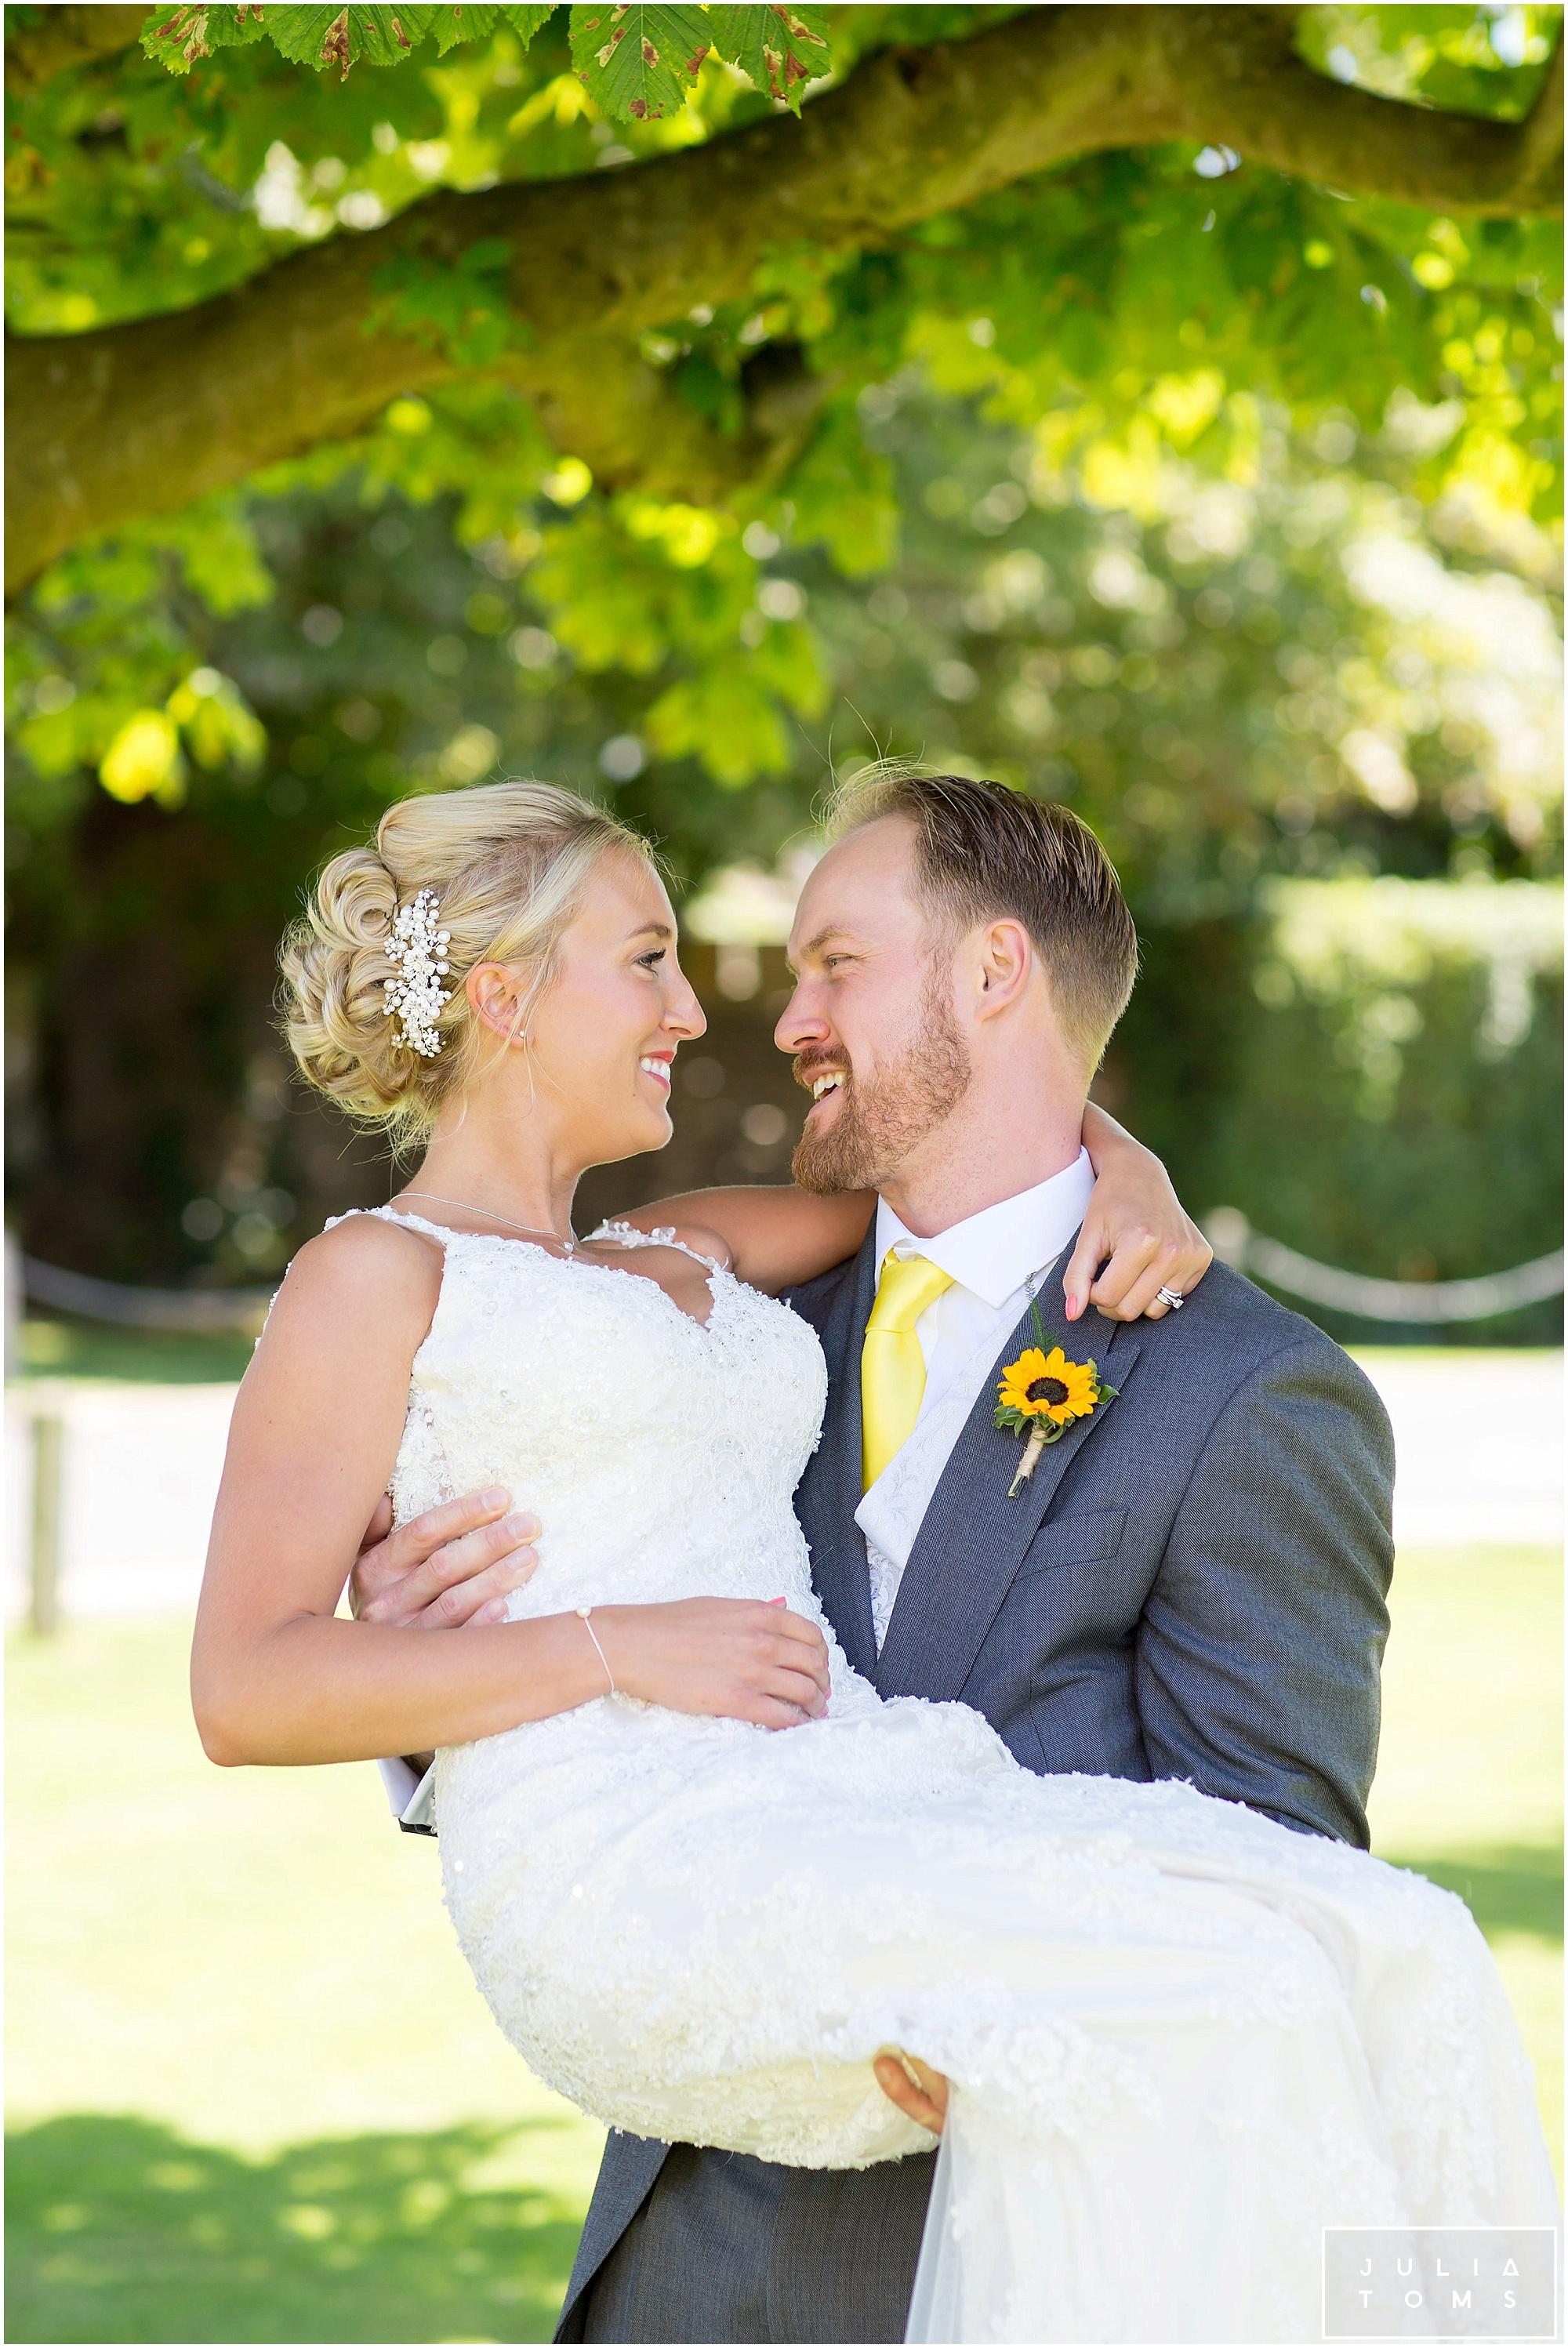 julia_toms_chichester_wedding_photographer_worthing_046.jpg